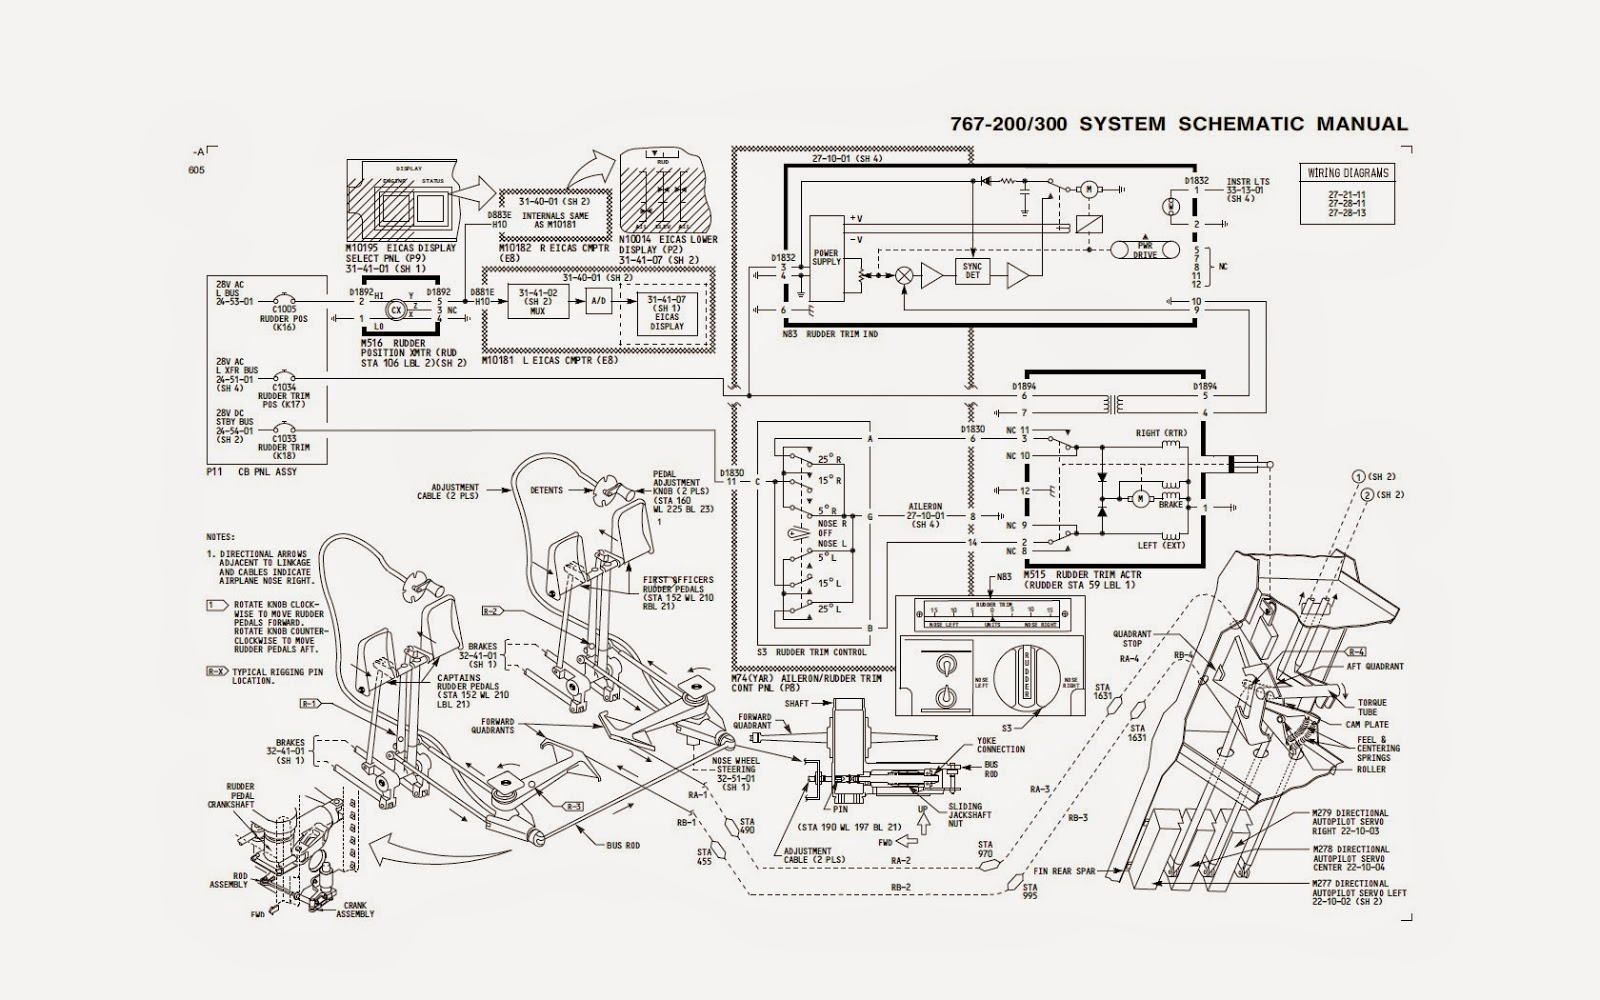 wiring diagram manual boeing basic instruction manual u2022 rh ryanshtuff co boeing 747 wiring diagram manual boeing 747 wiring diagram manual